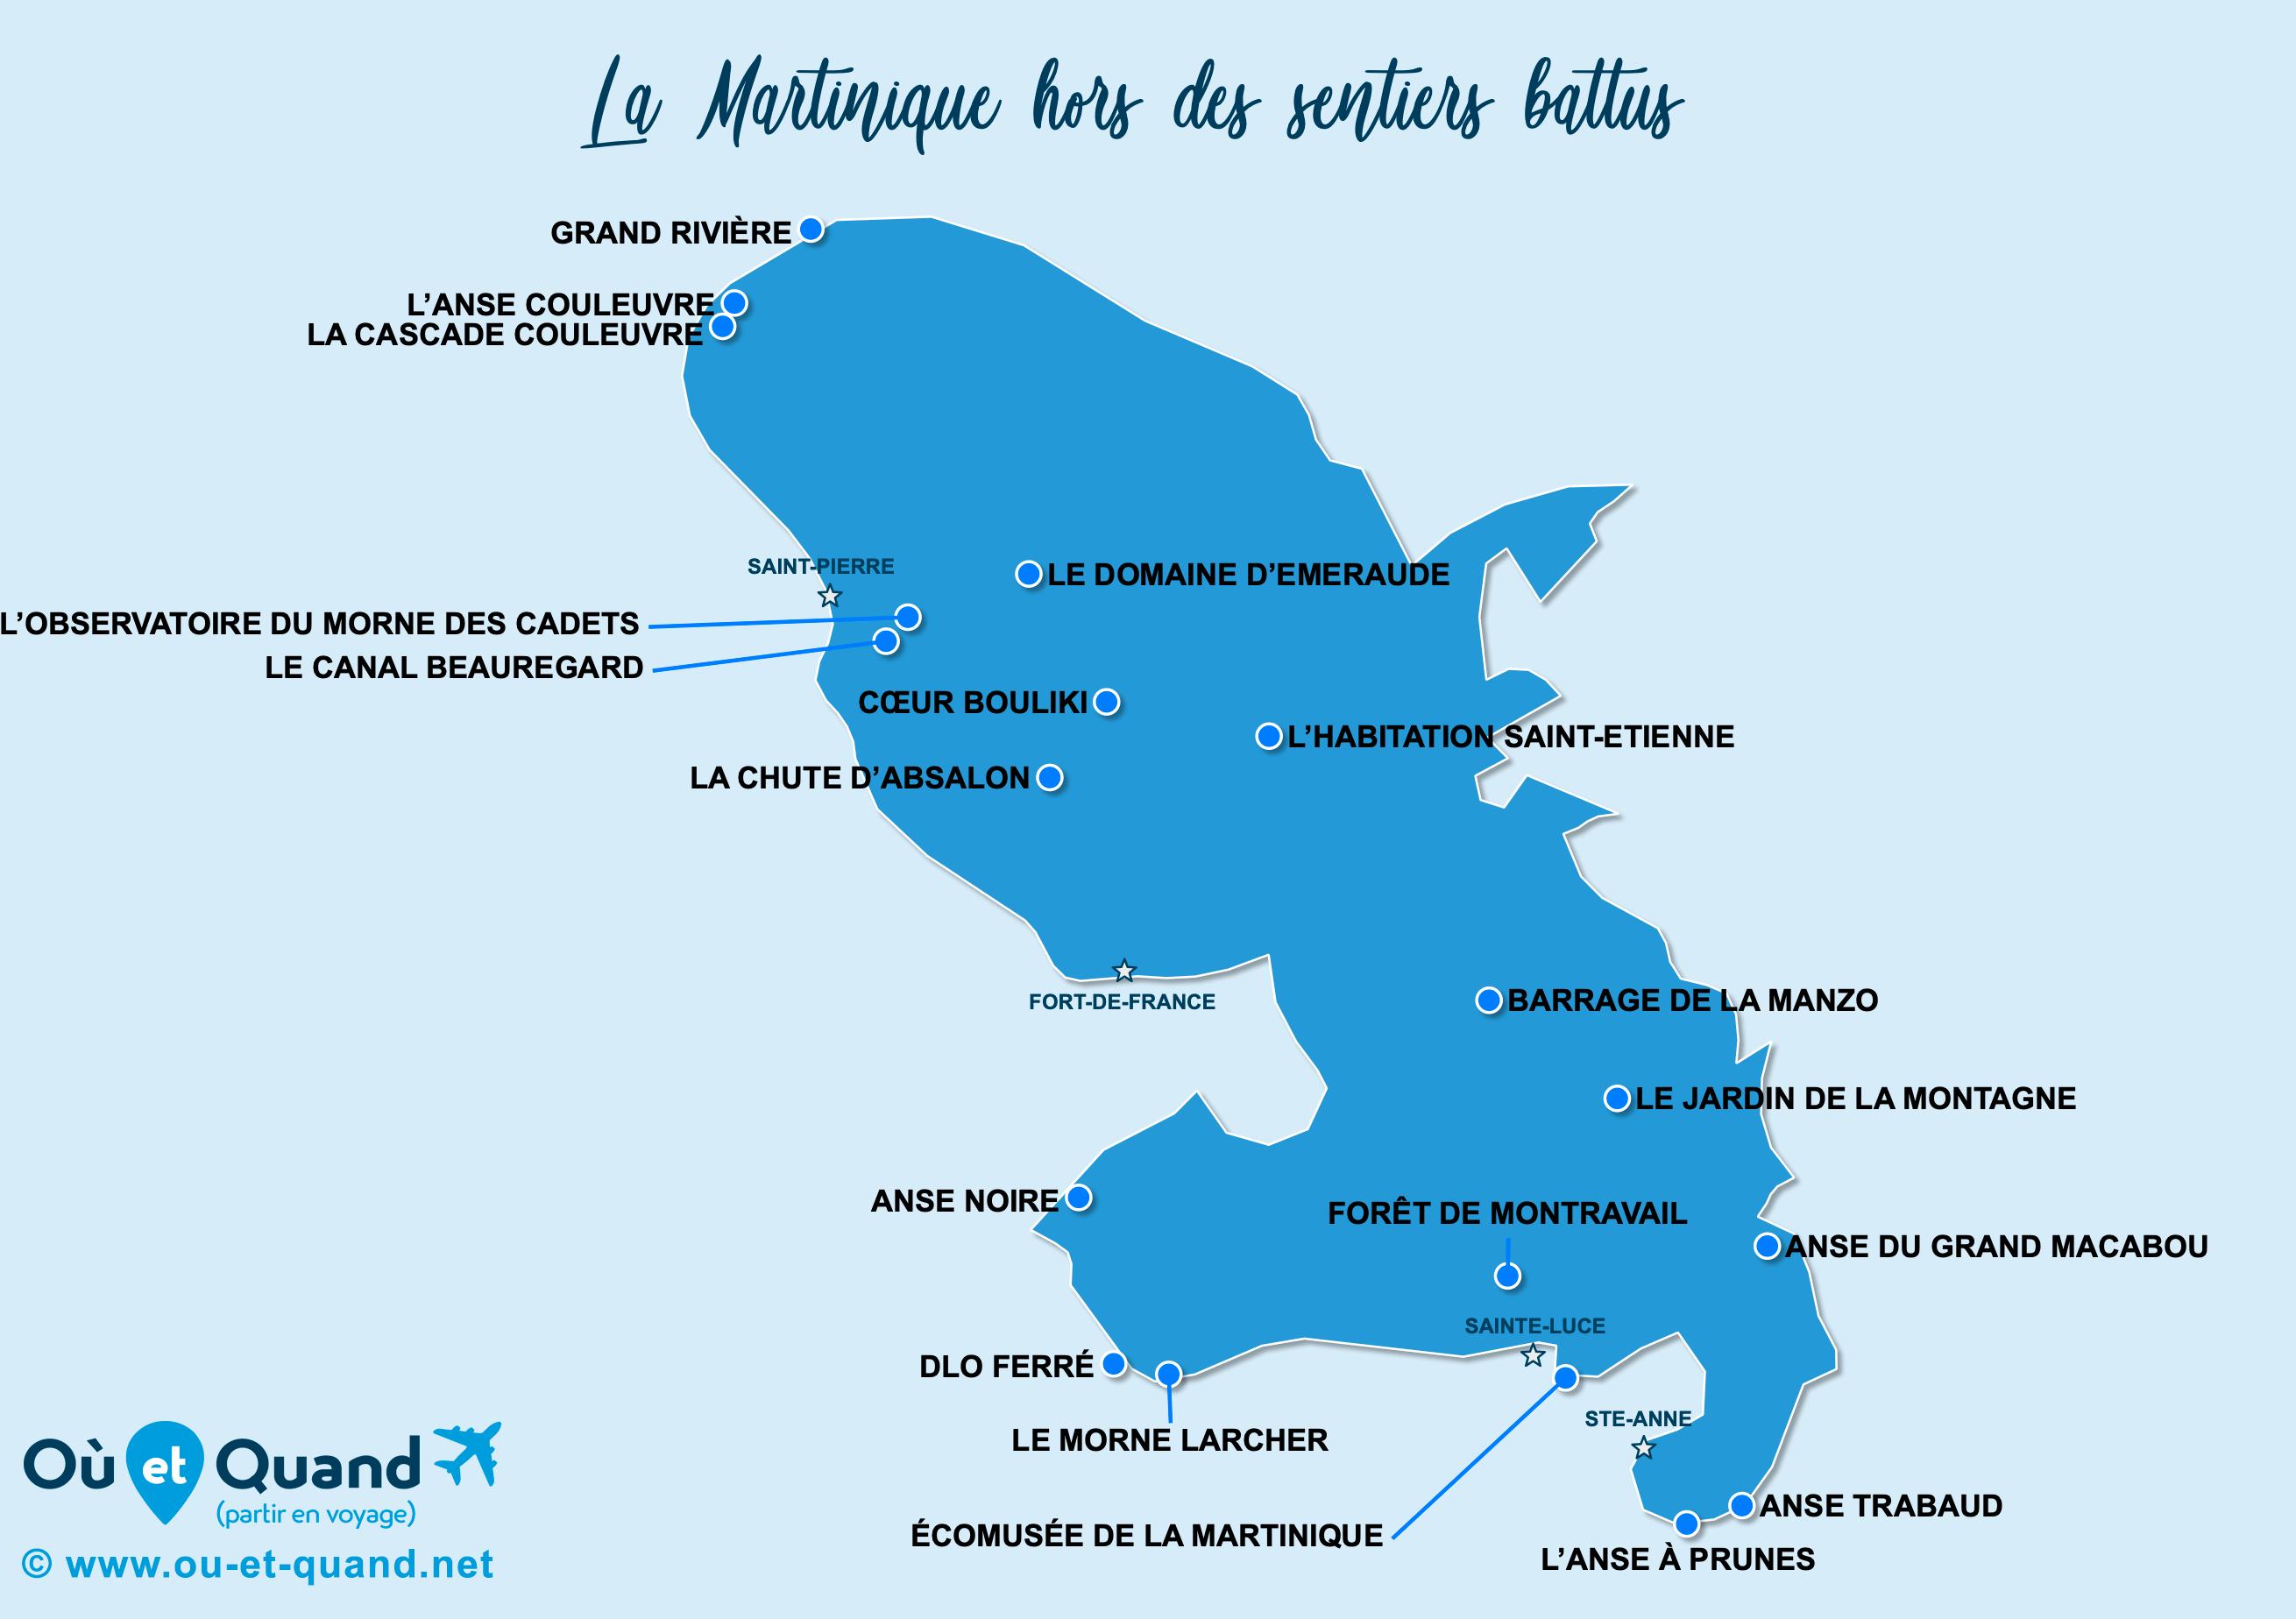 Carte Martinique : La Martinique hors des sentiers battus